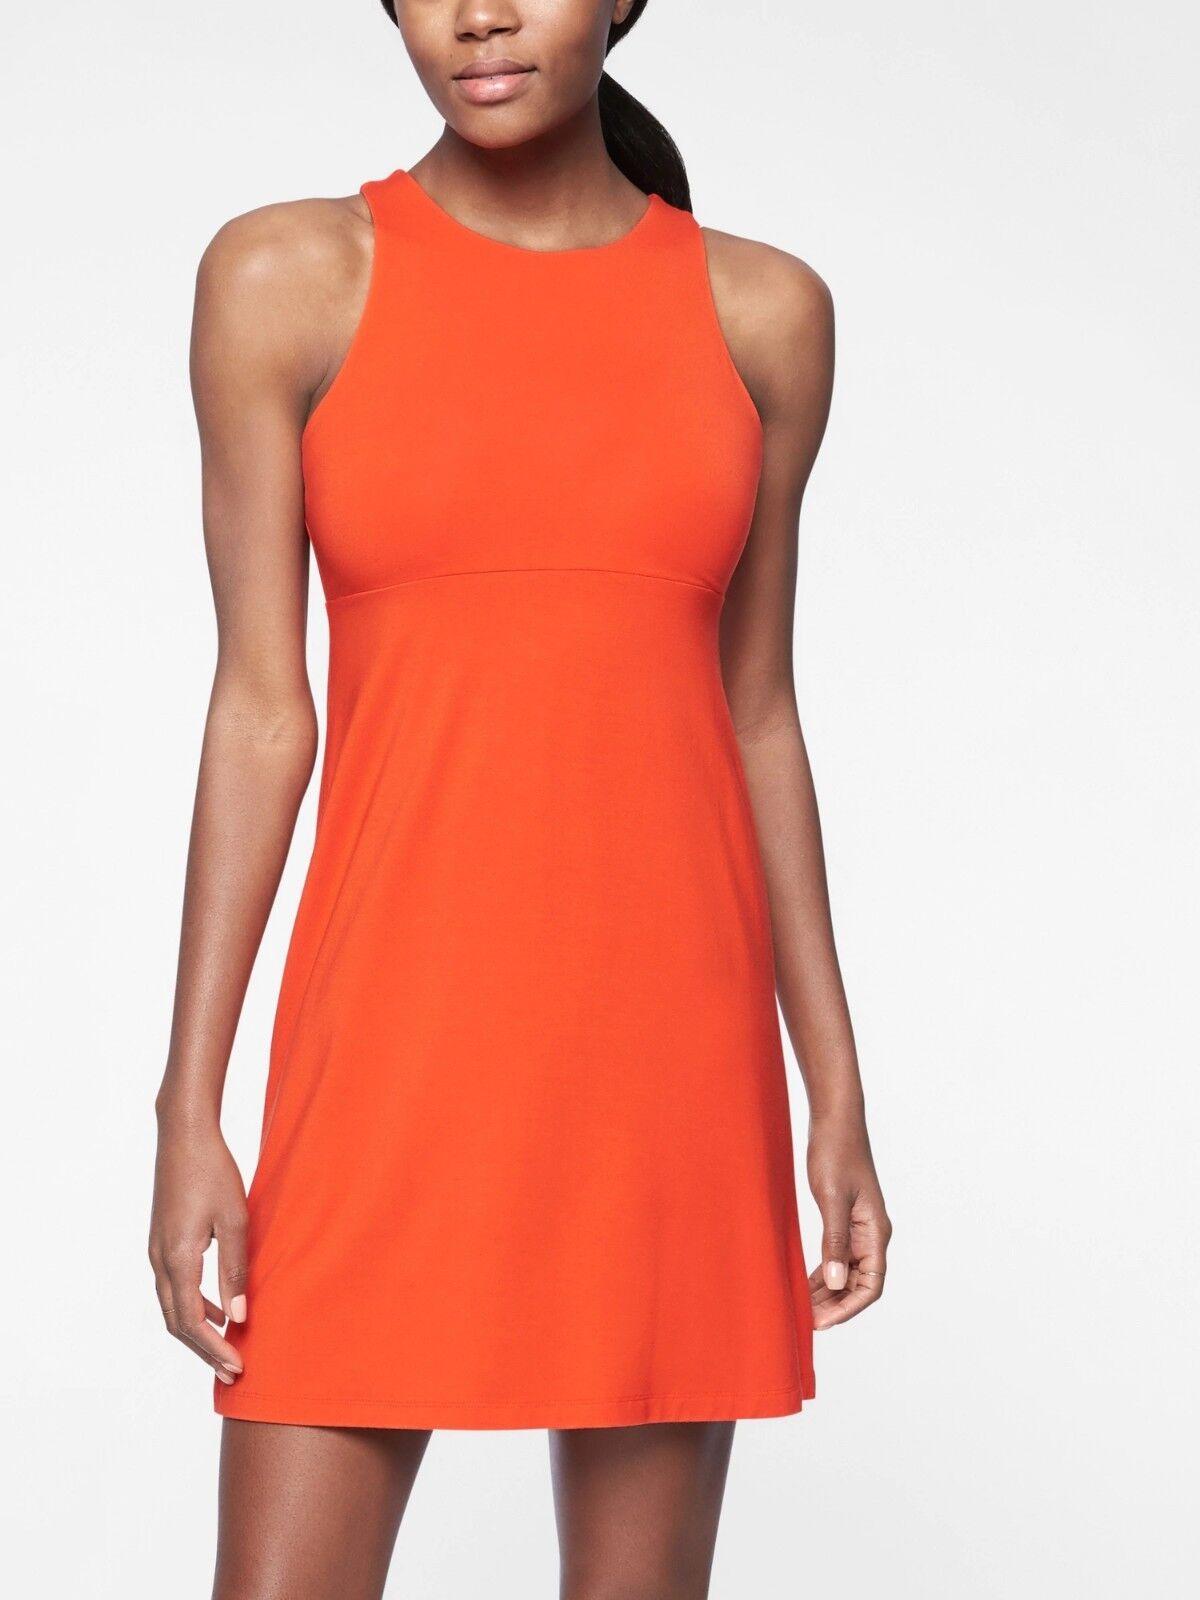 Athleta Santorini High Neck Solid Dress, On Fire Größe L         N0422